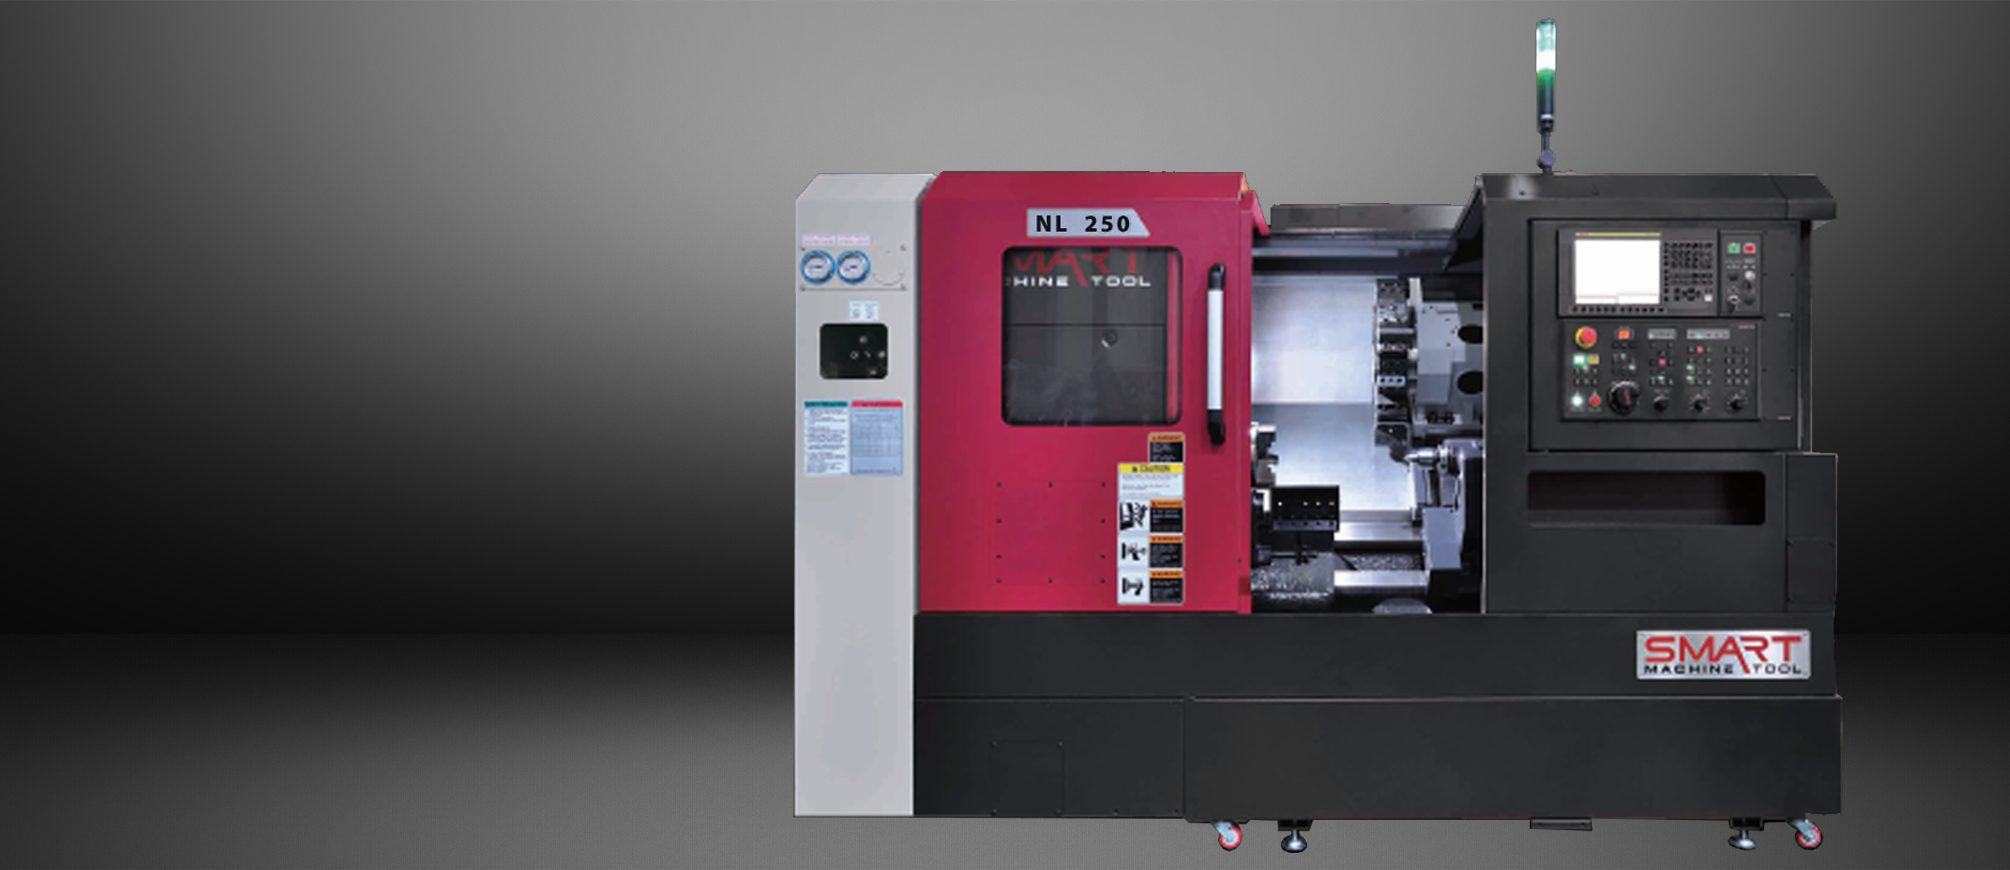 SMART NL 250 – BOX WAY – (10″ CHUCK) 2-Axis CNC Lathes